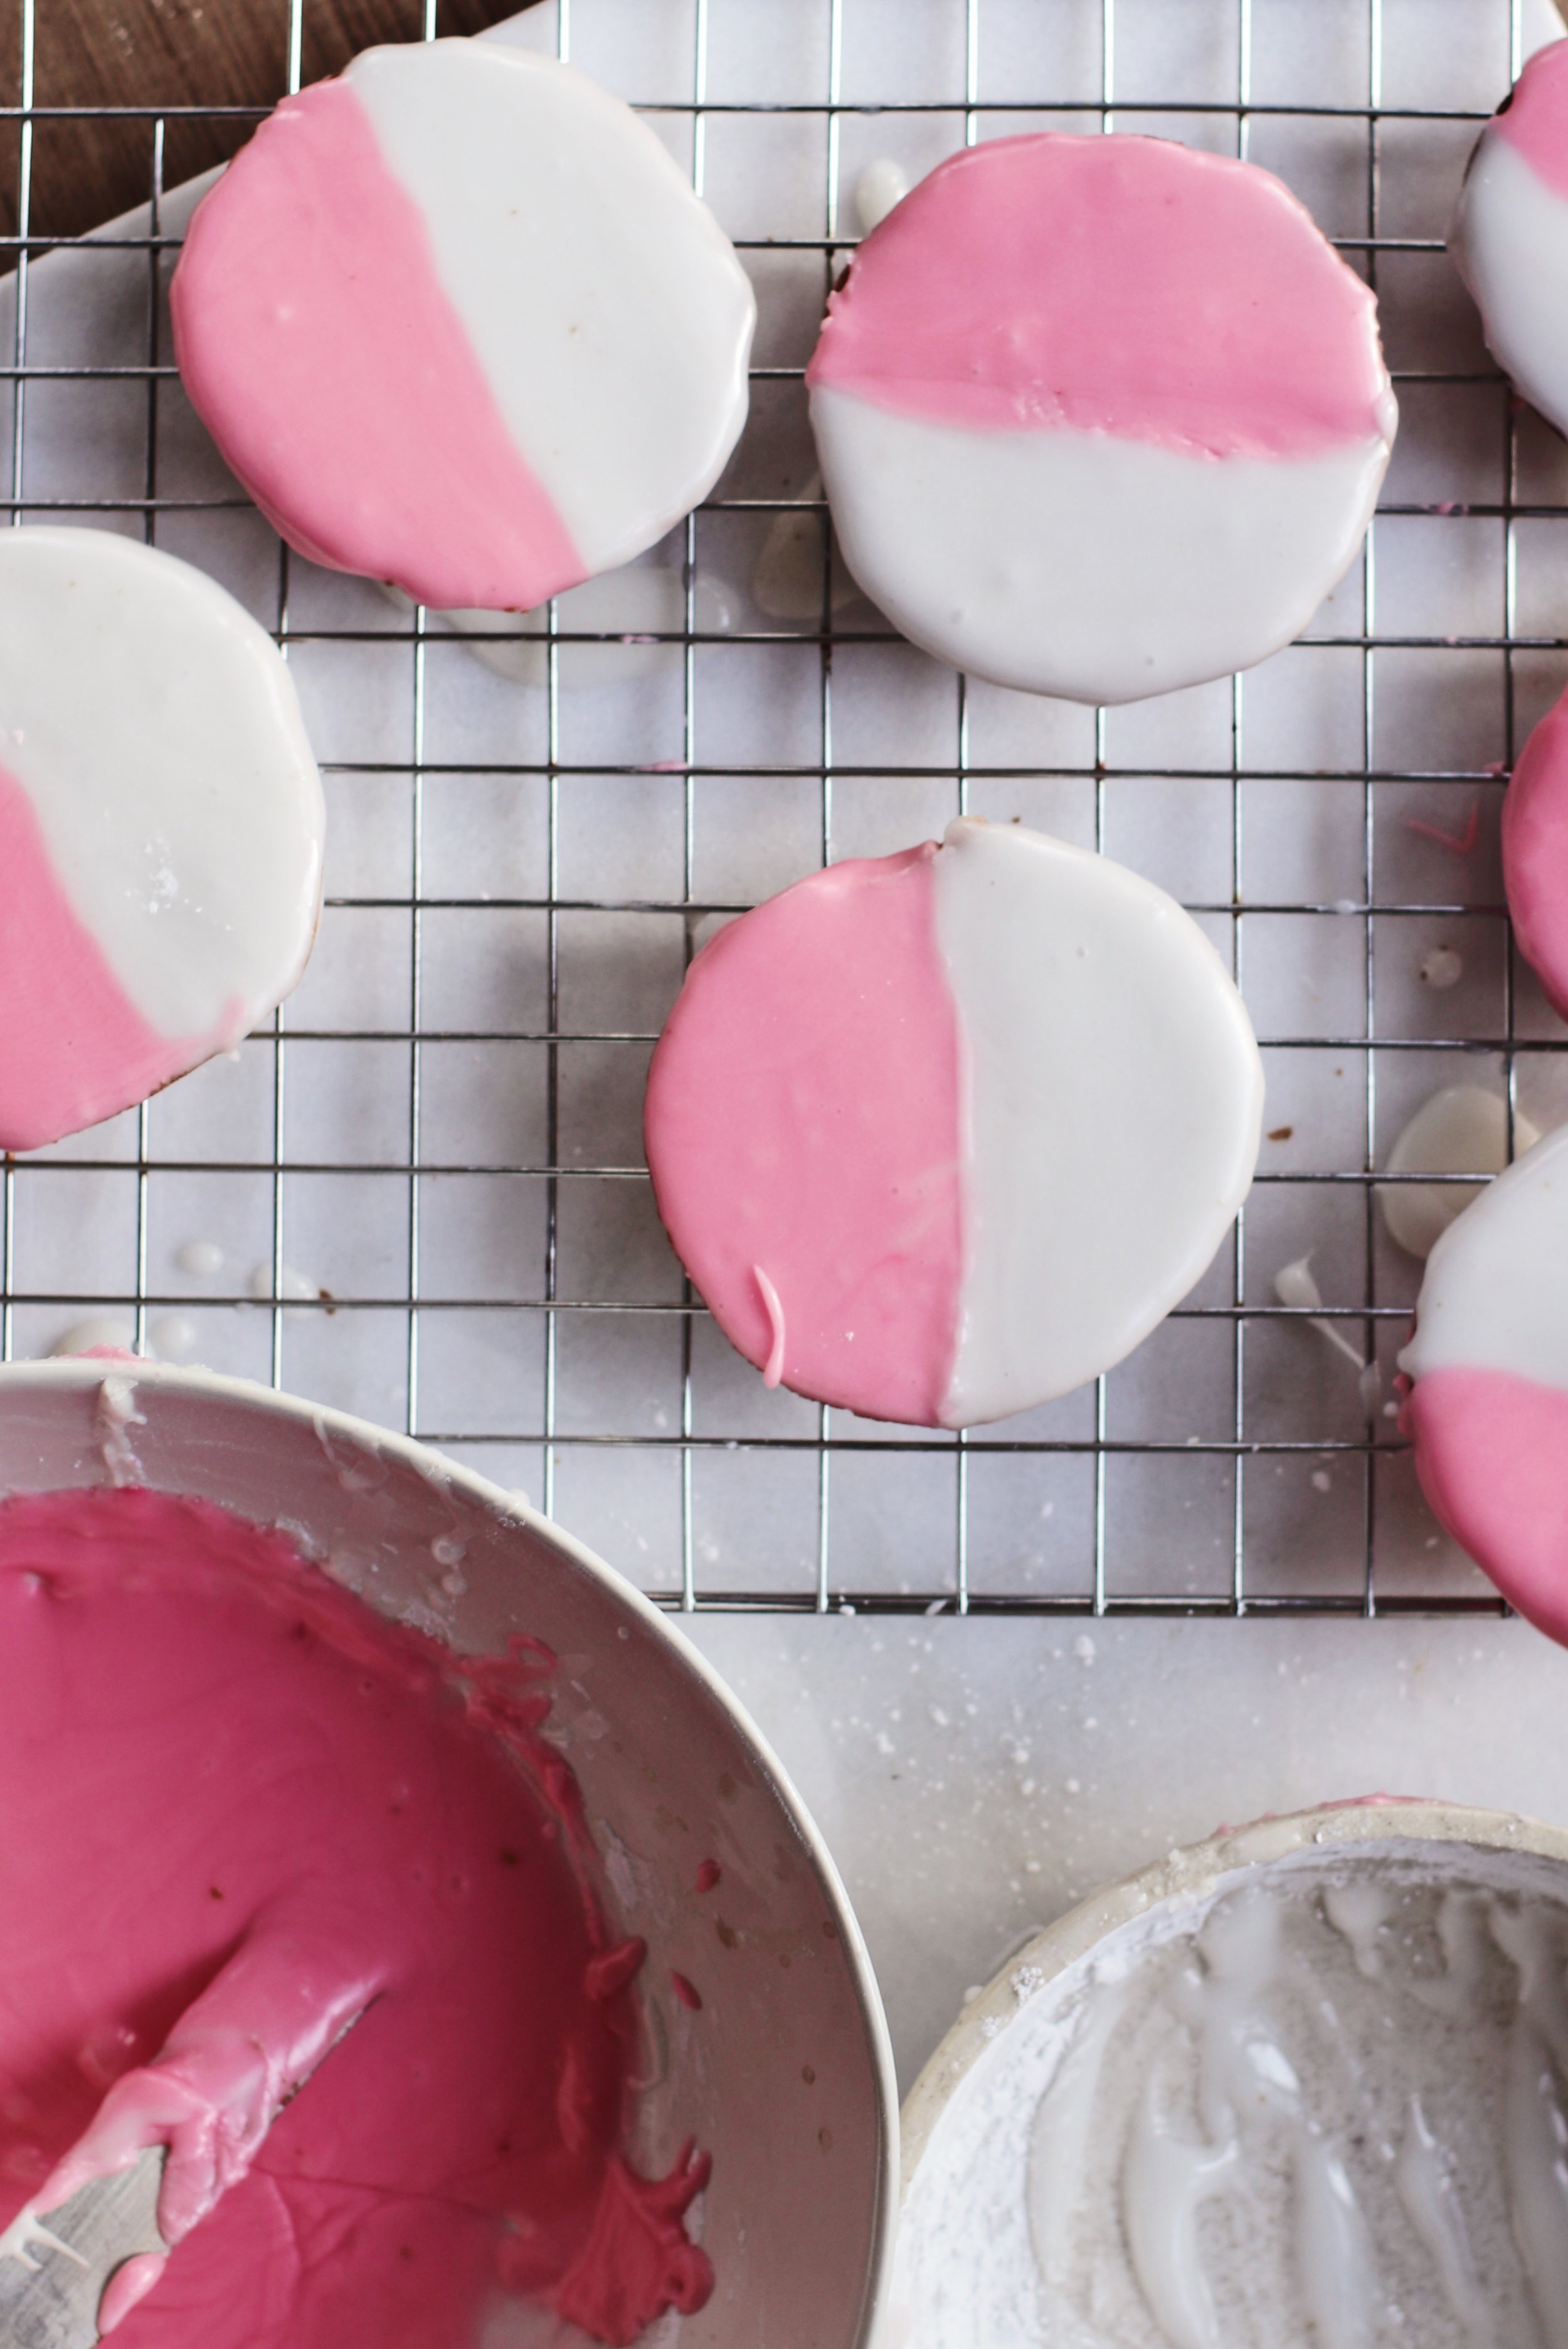 pink-and-white-cookies-black-white-cookies-recipe-new-york-city-jewish-cookie.jpg